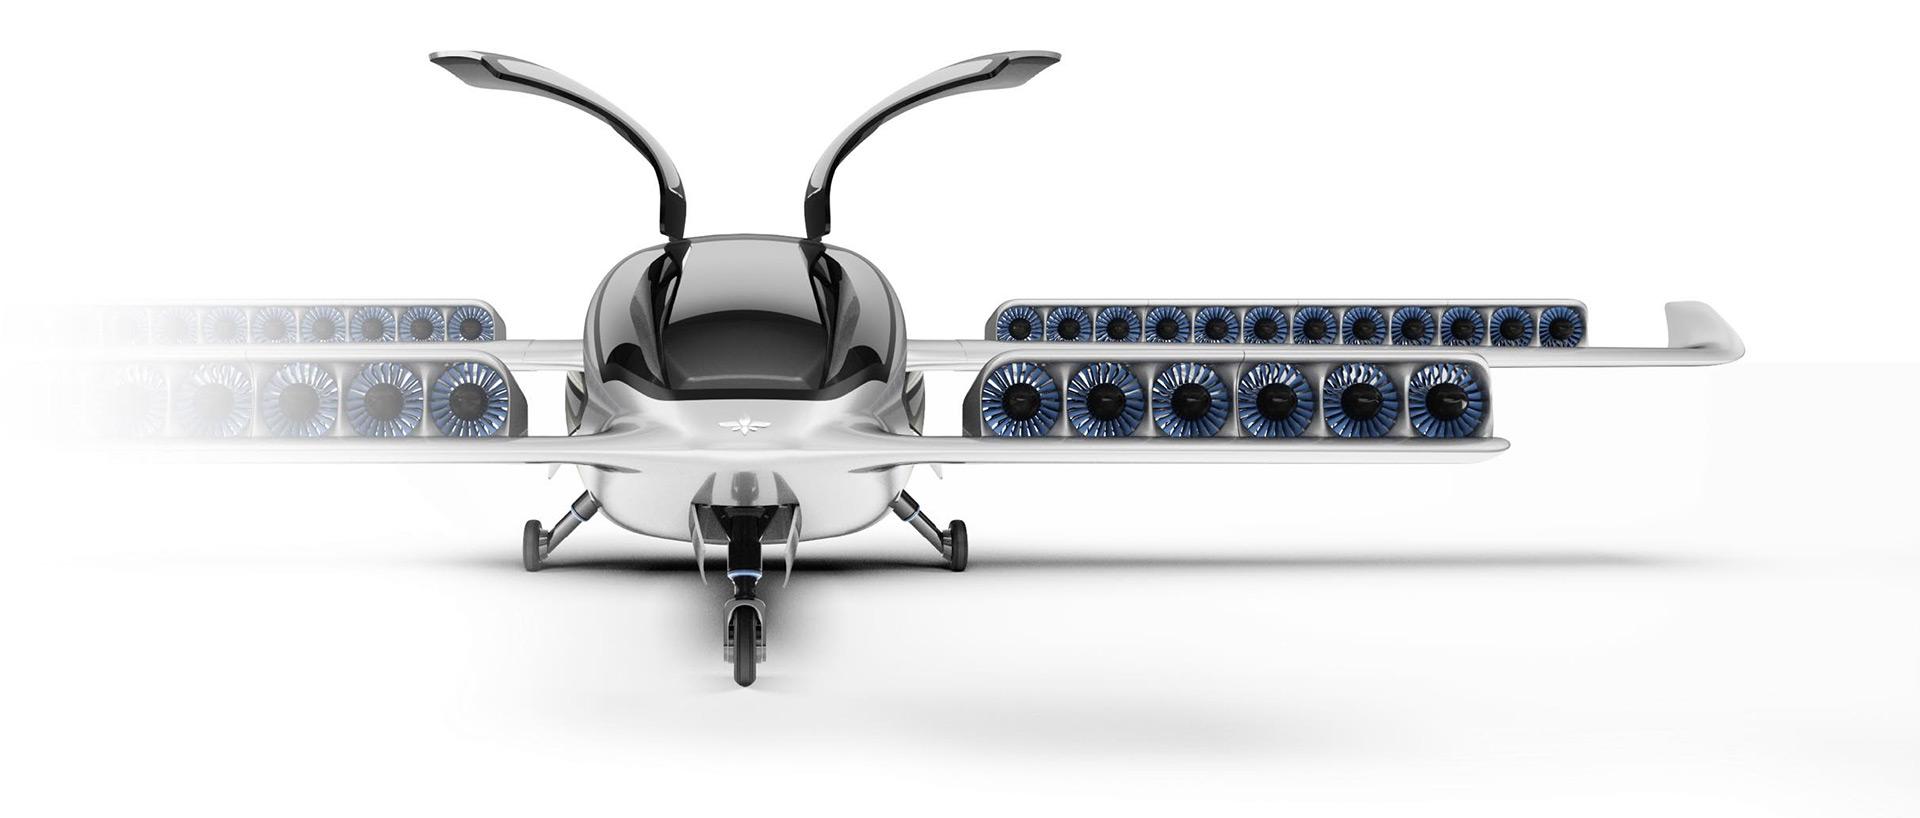 Lilium Electric Jet has gull-wing doors